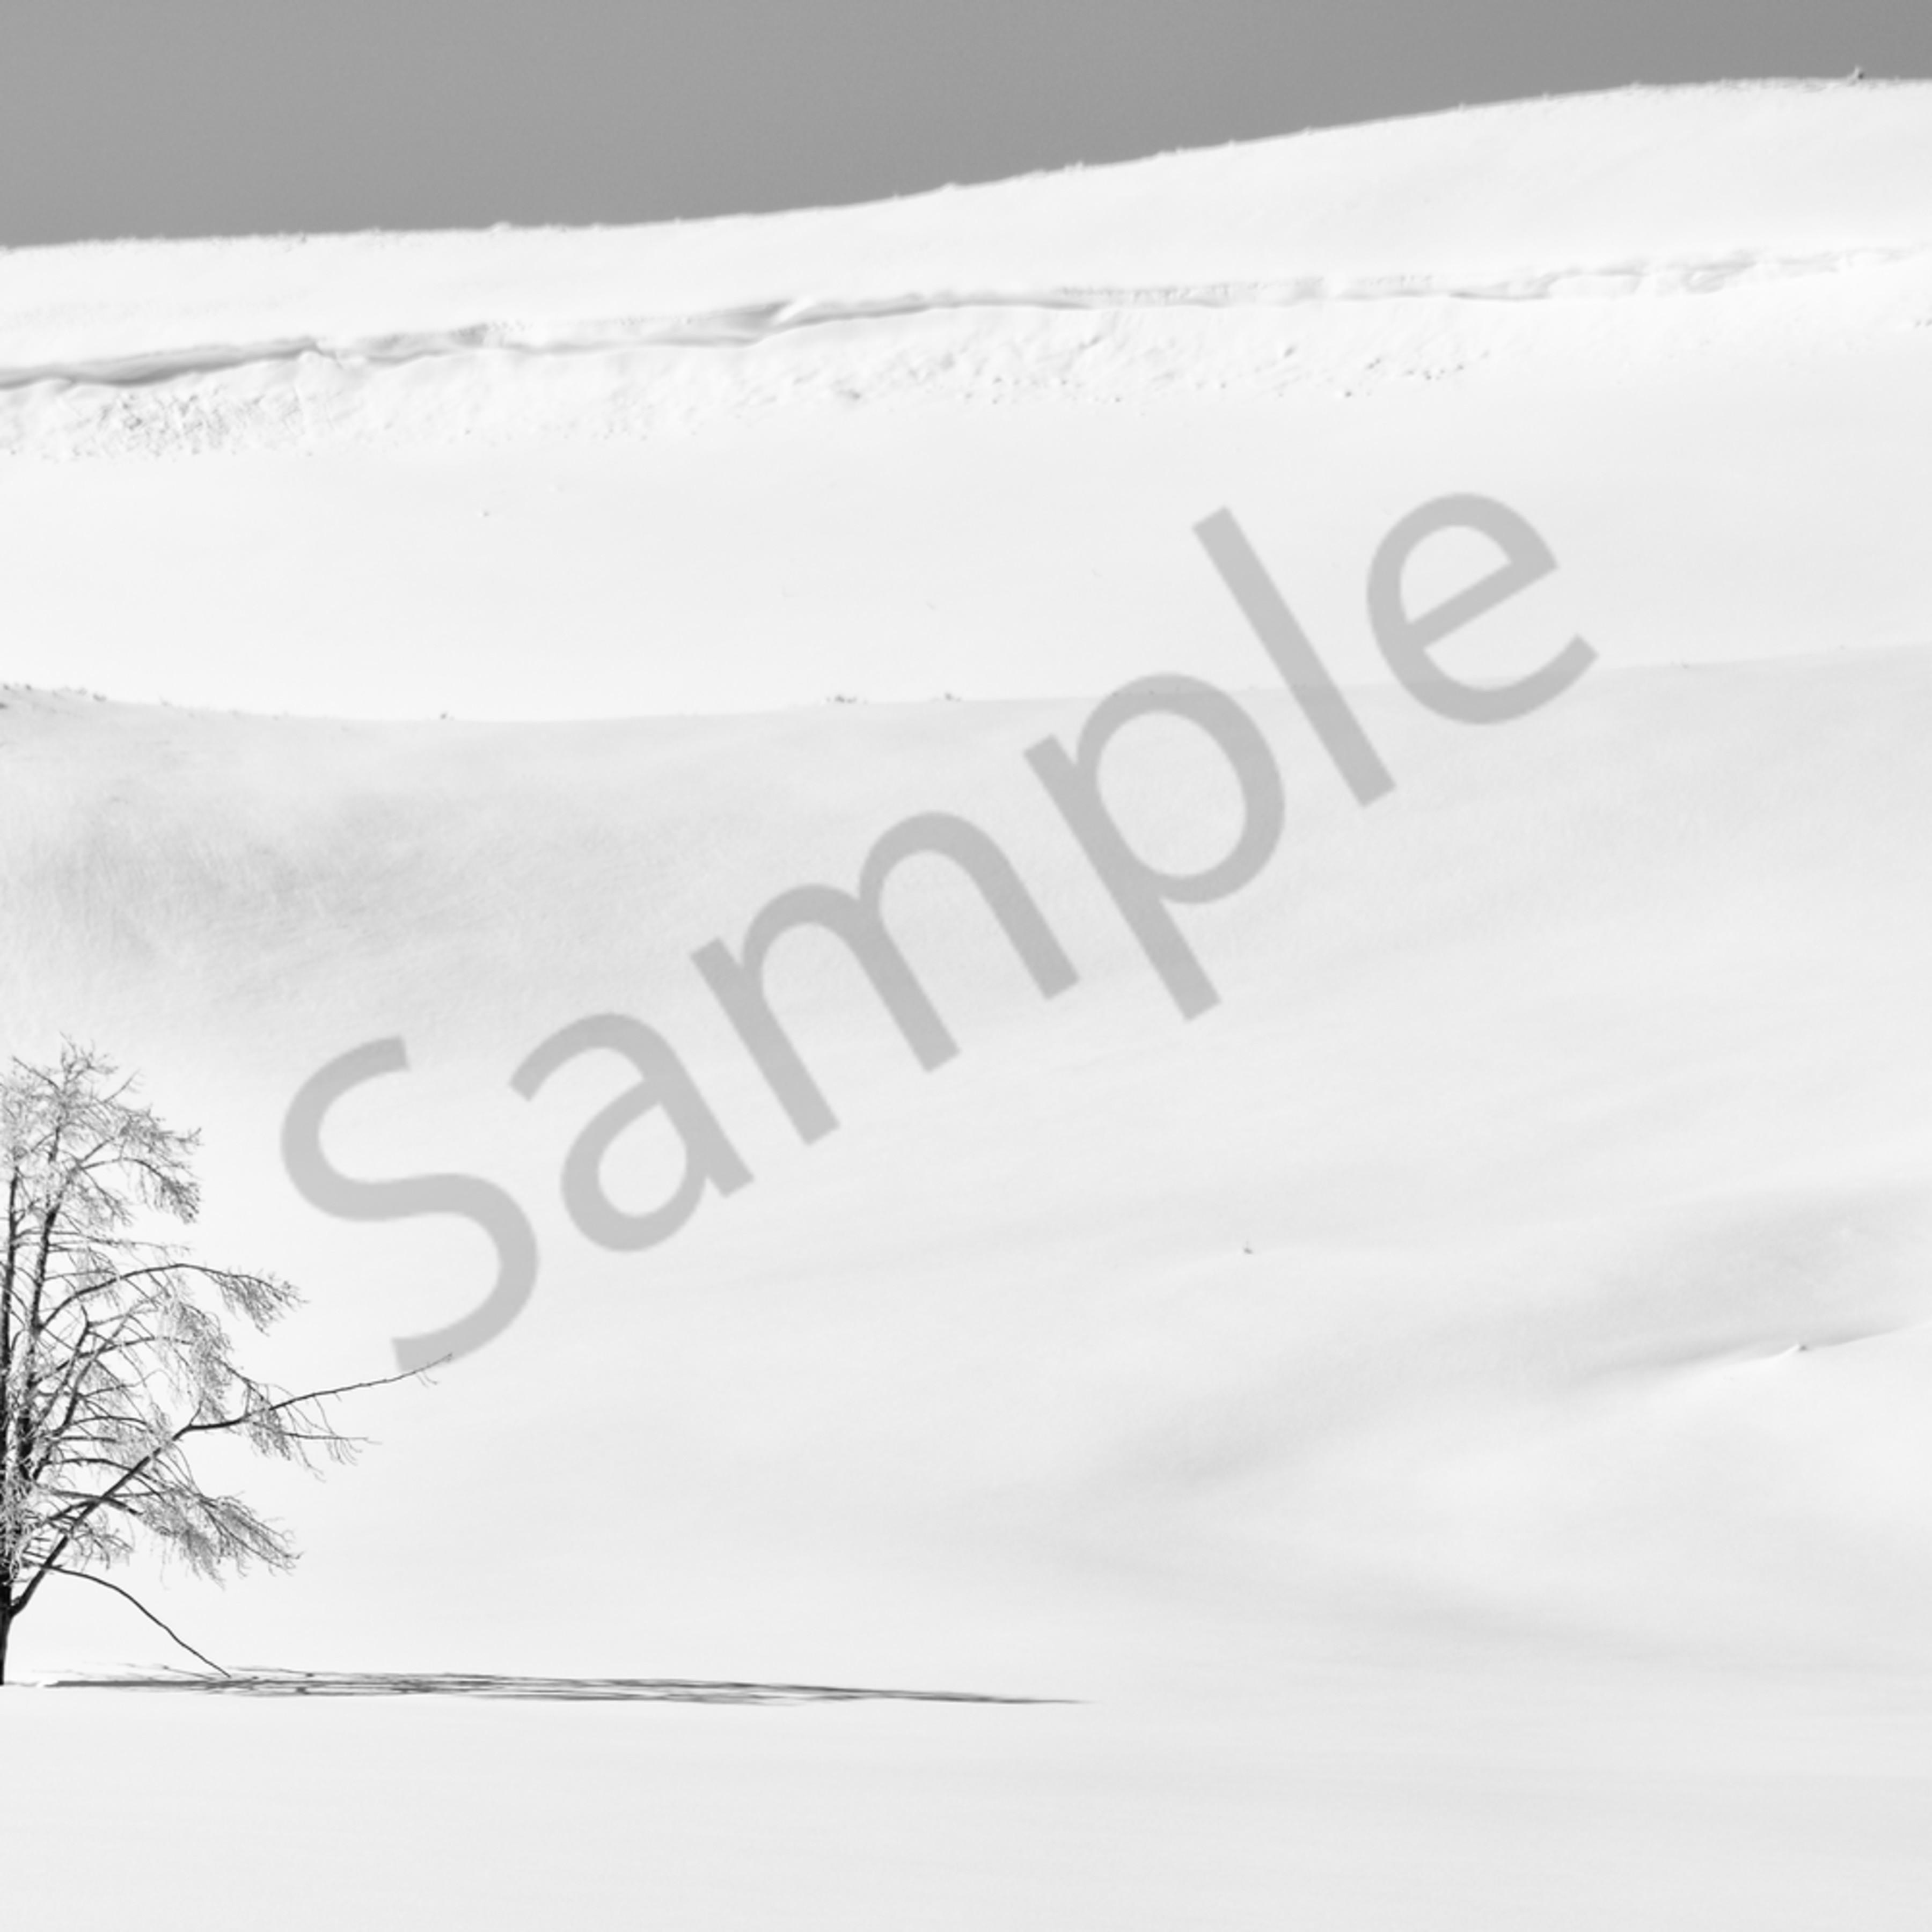 2 dsc 9212 lonesome tree 12x24 crop bw top blur pv2rj9